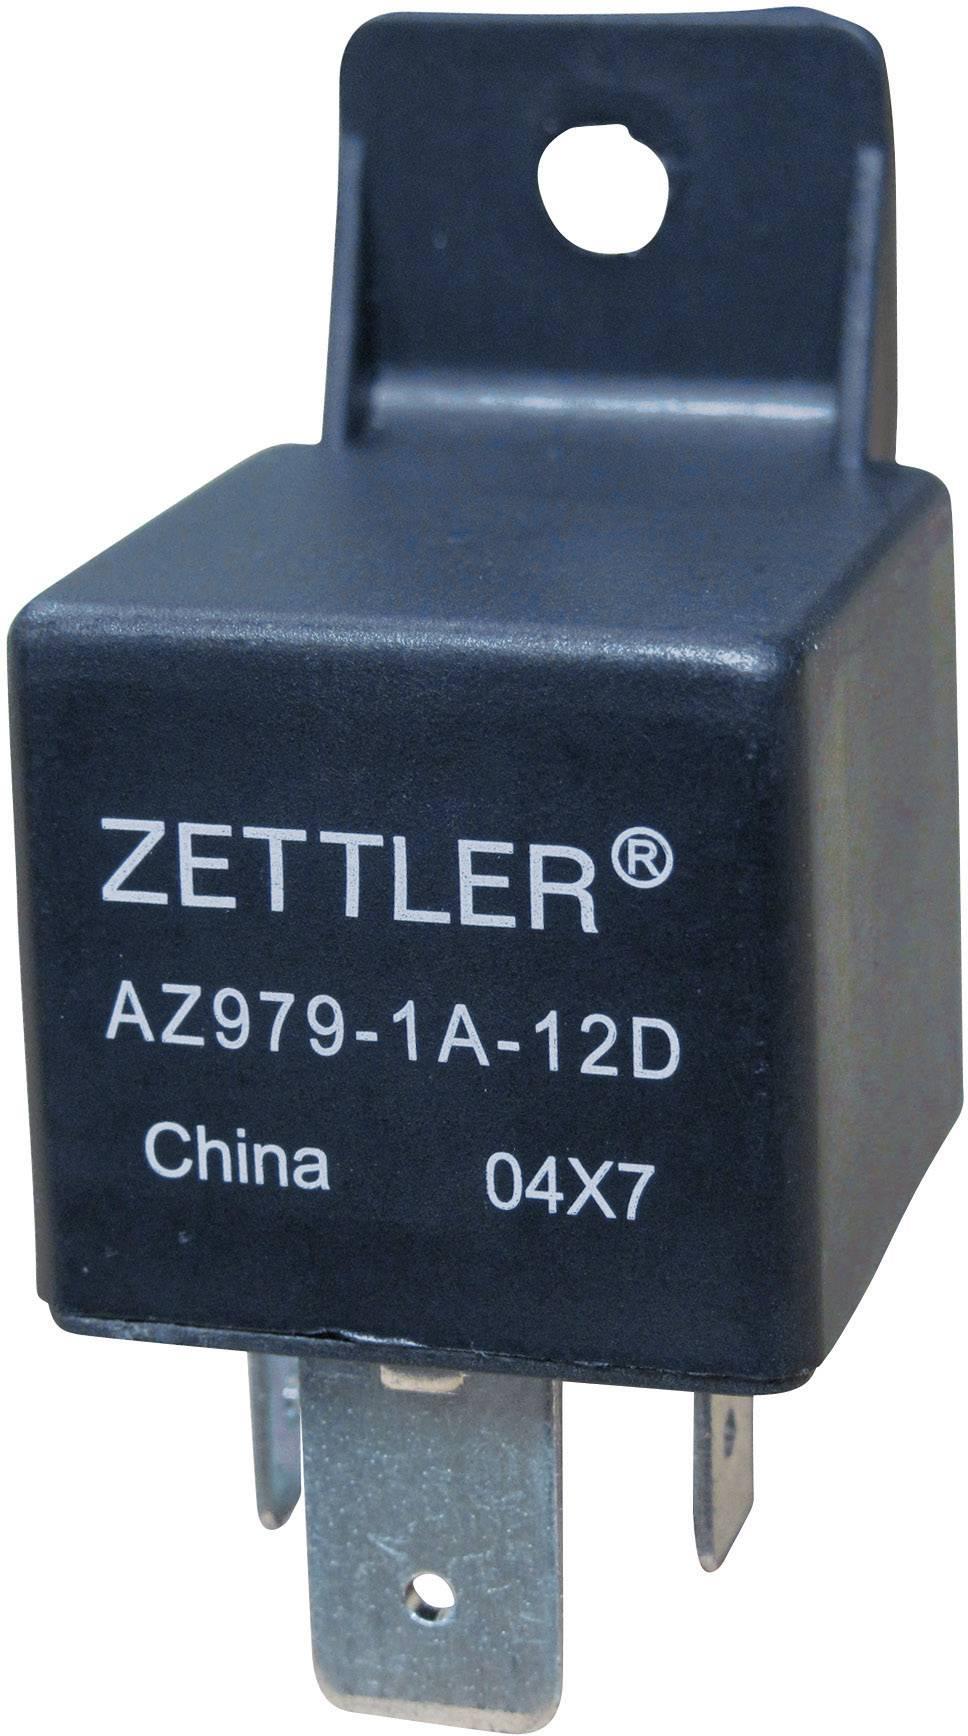 Miniaturní automobilové relé Zettler Electronics AZ979-1A-24D